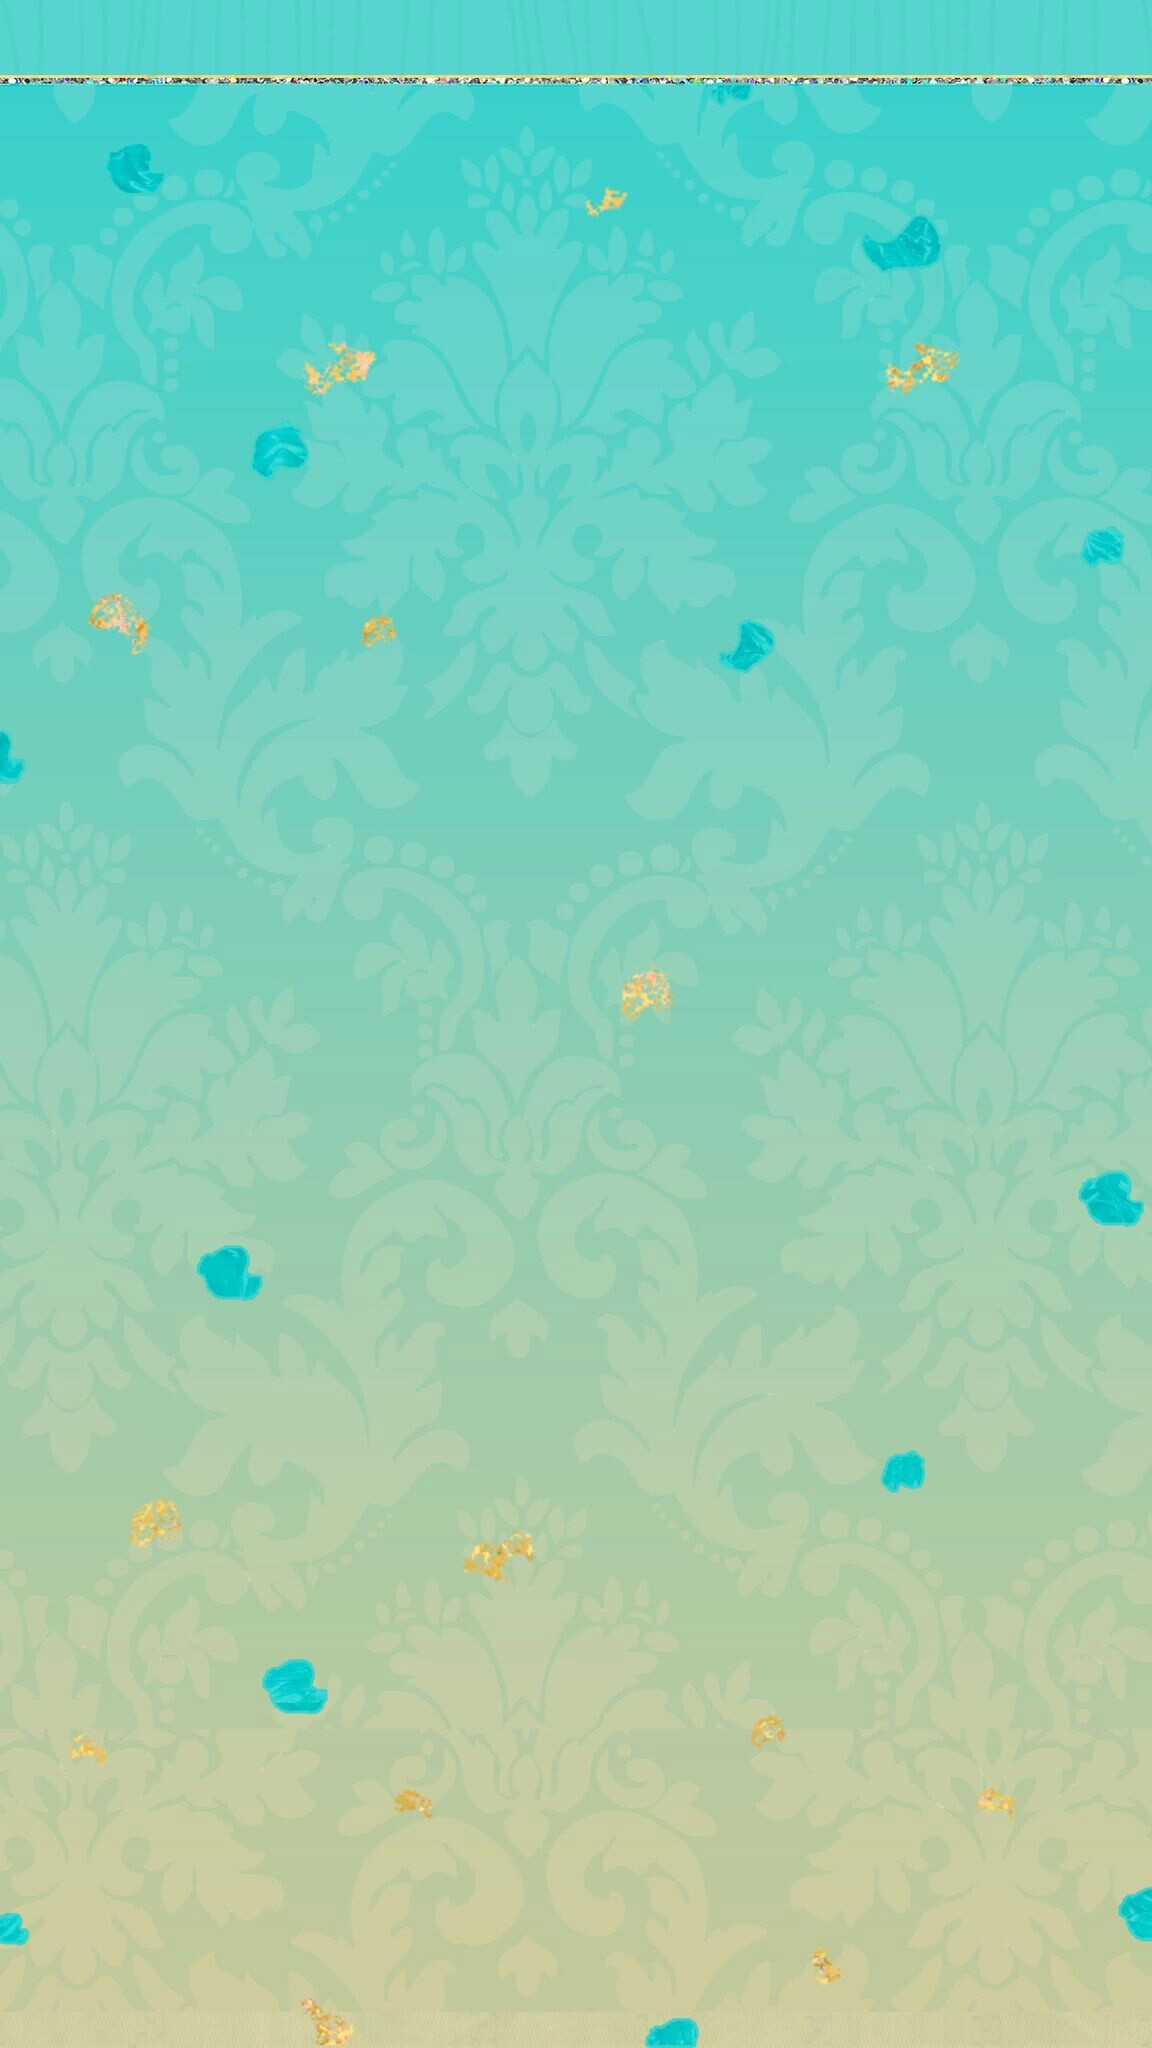 Cute Wallpapers, Iphone Wallpaper, Paisley, Aqua, Glitter, Girly, Walls,  Pretty